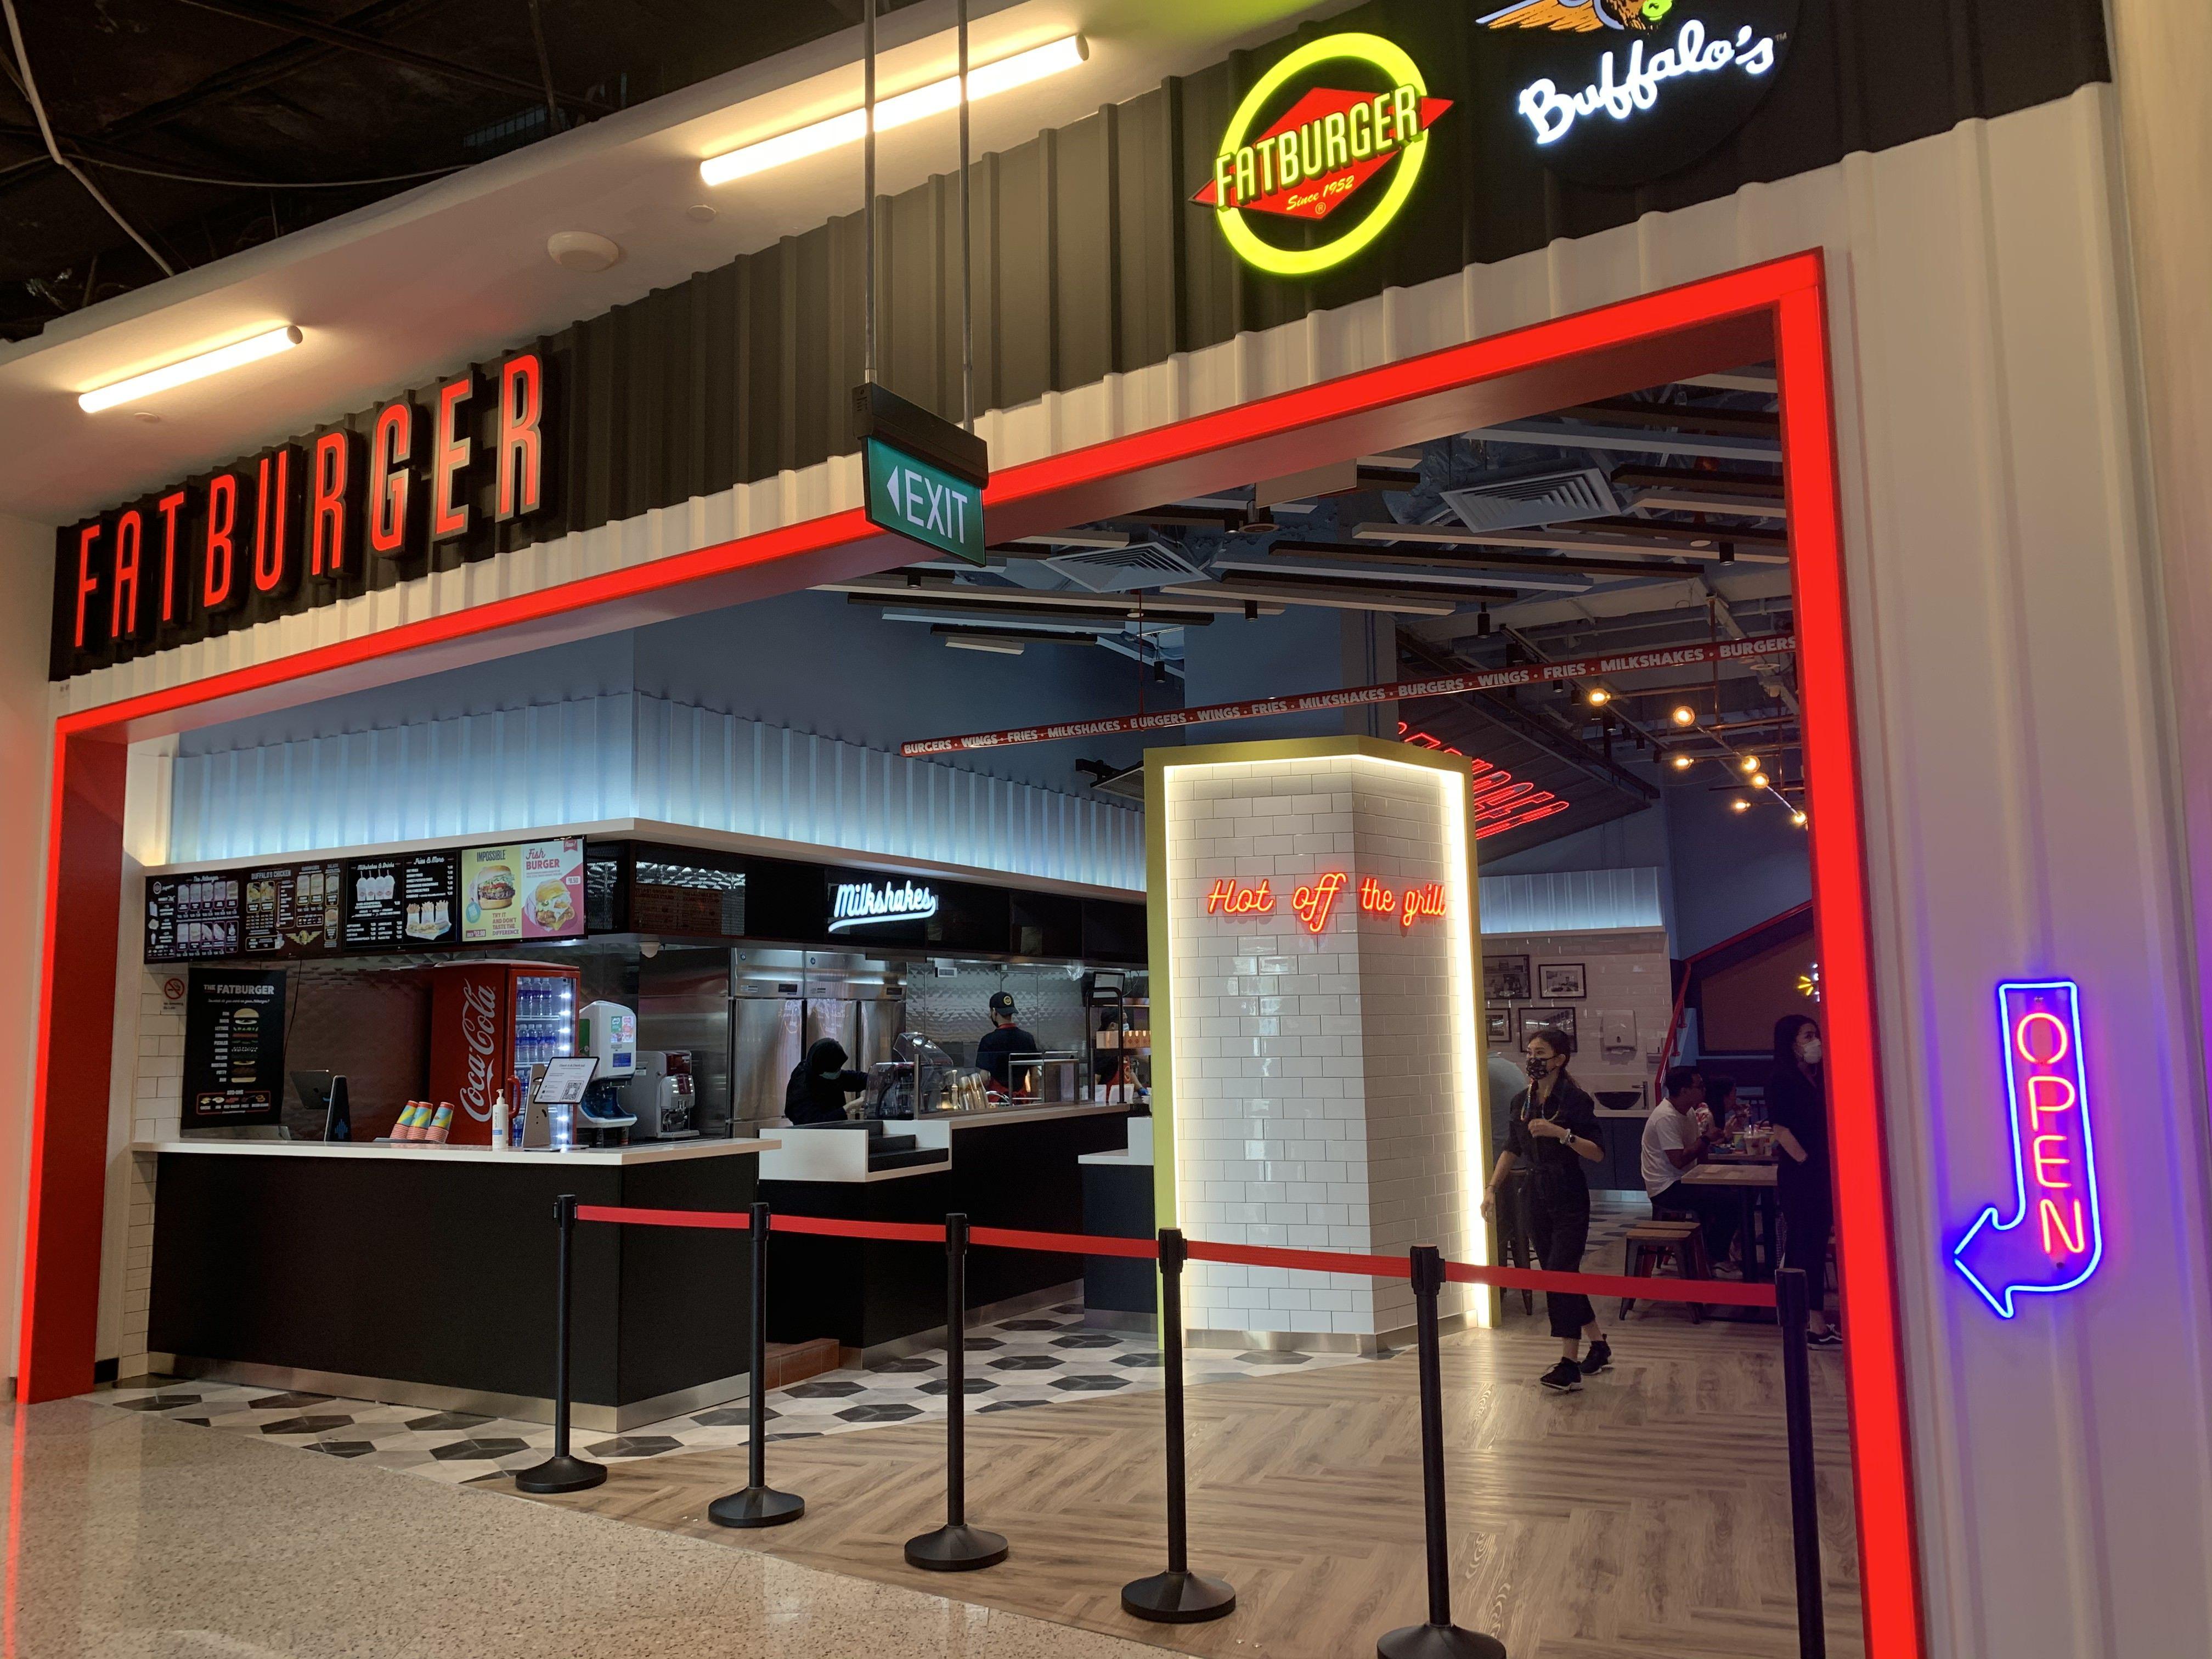 Fatburgers flagship store Cineleisure Orchard